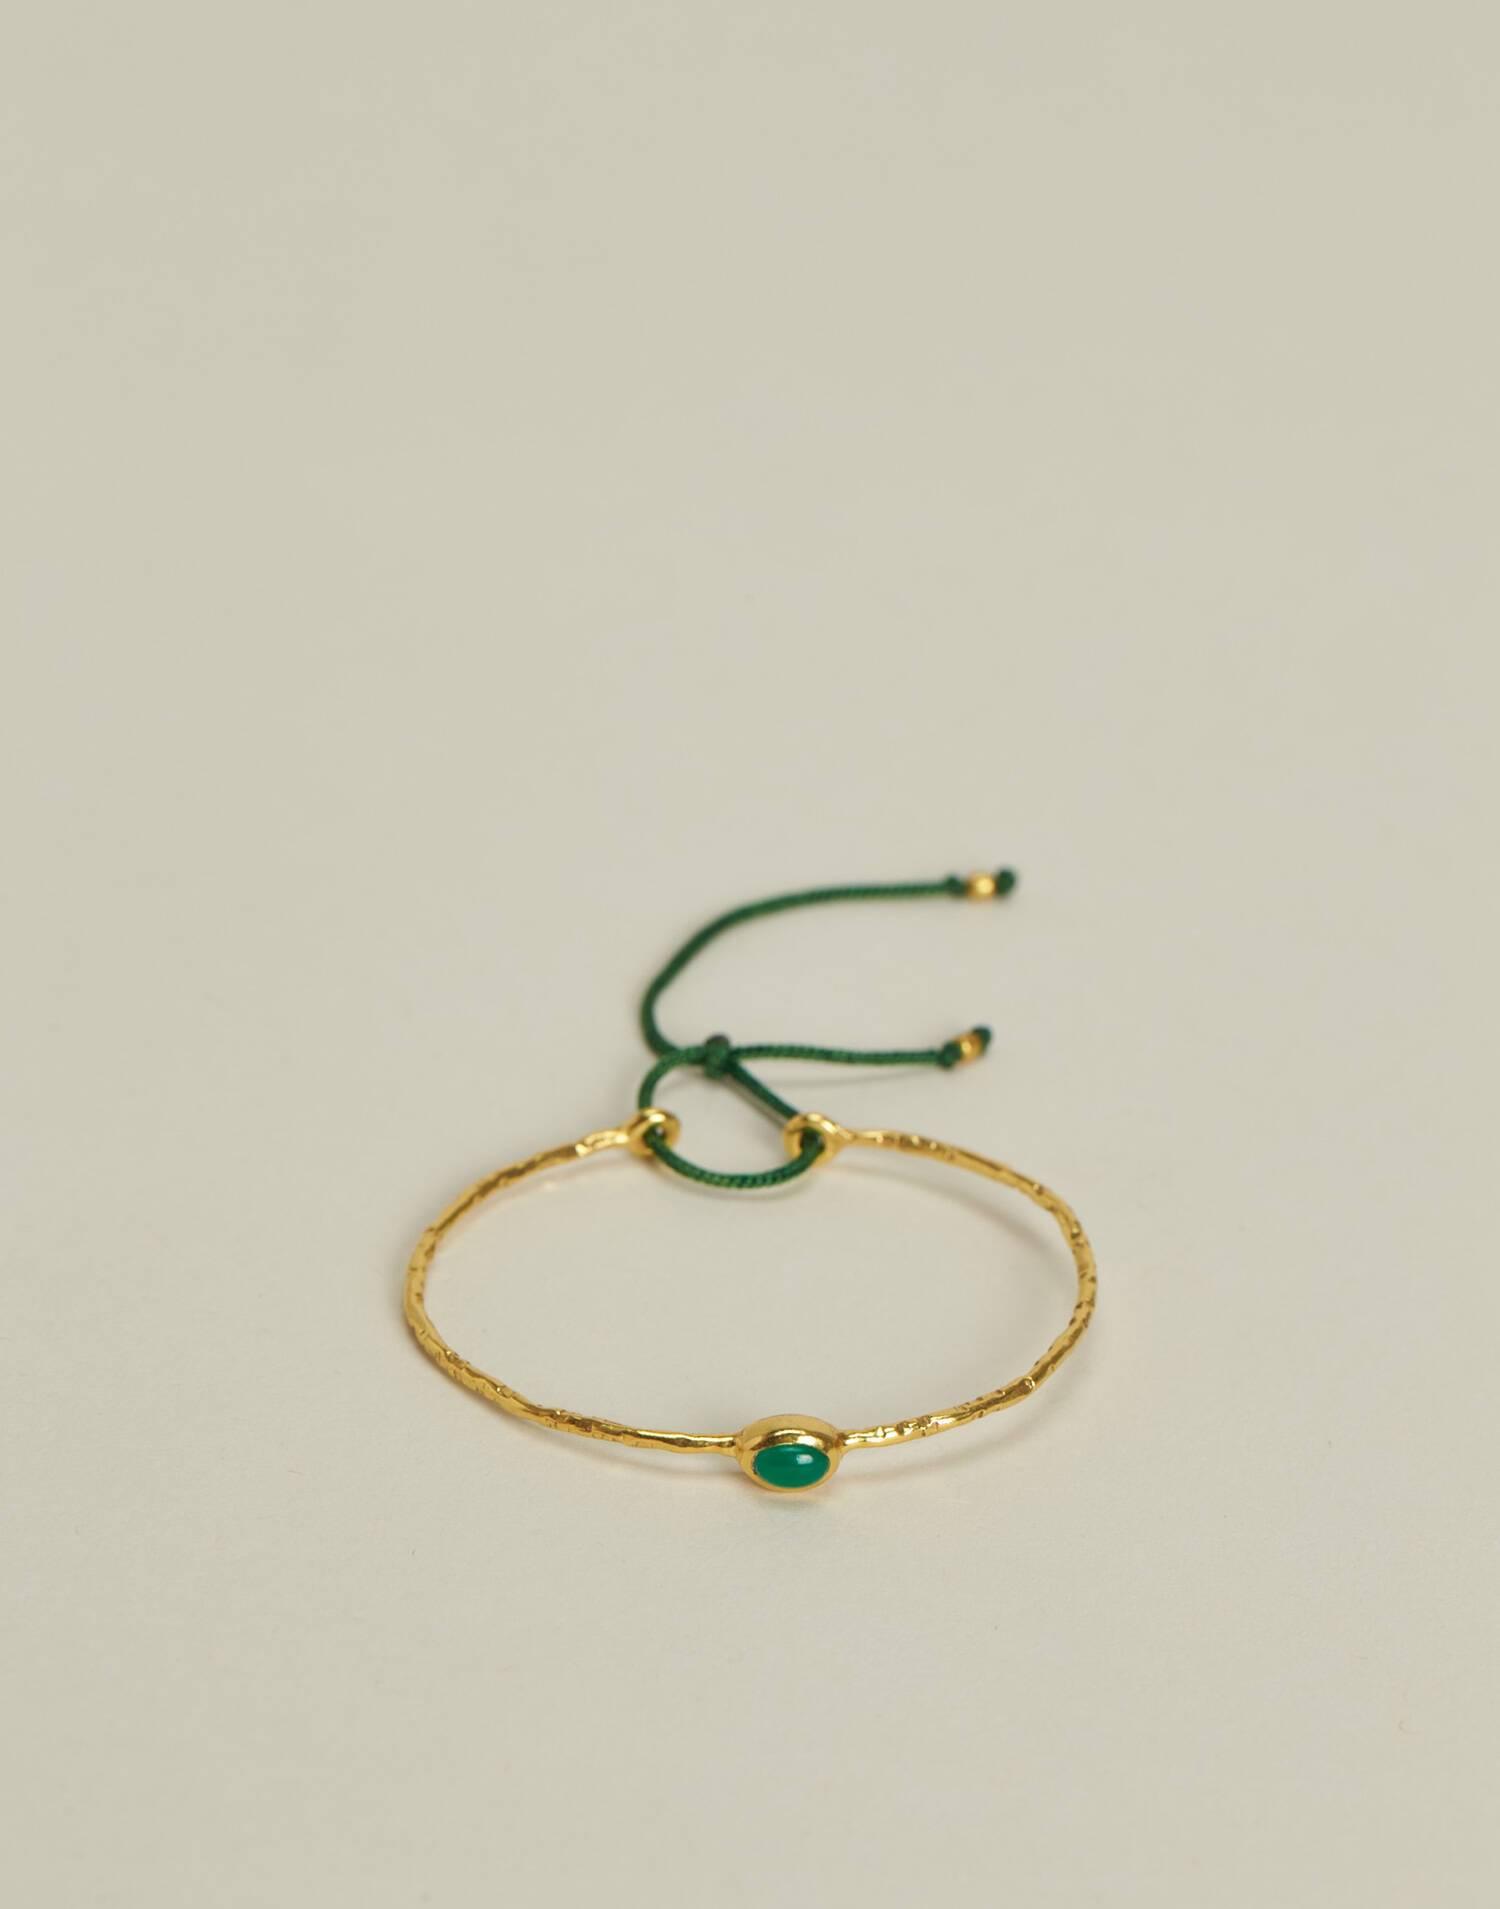 Adjustable bracelet with stone